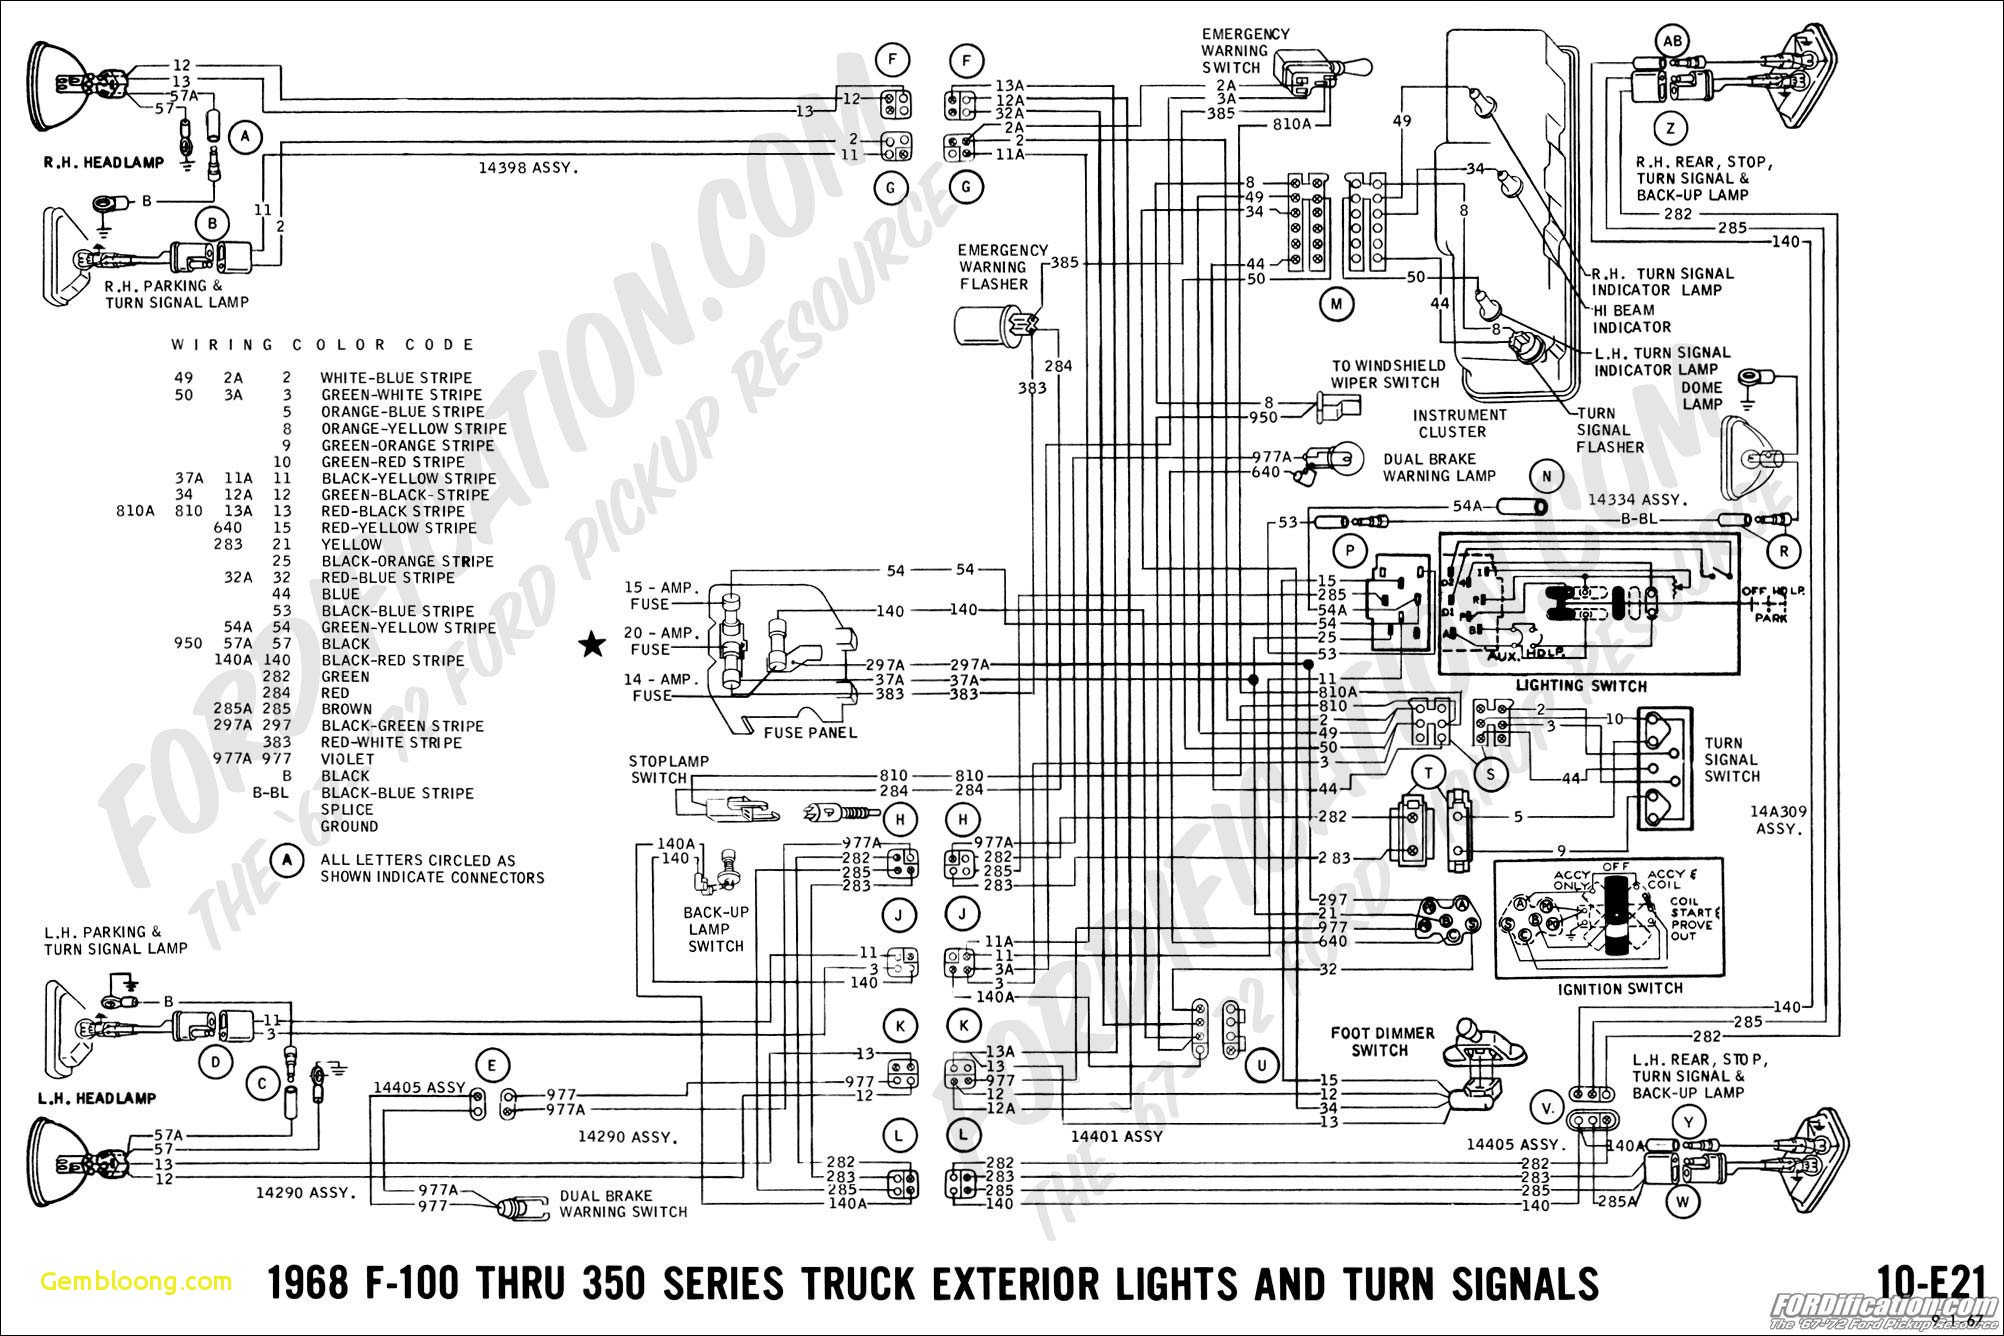 2004 volvo s40 engine diagram